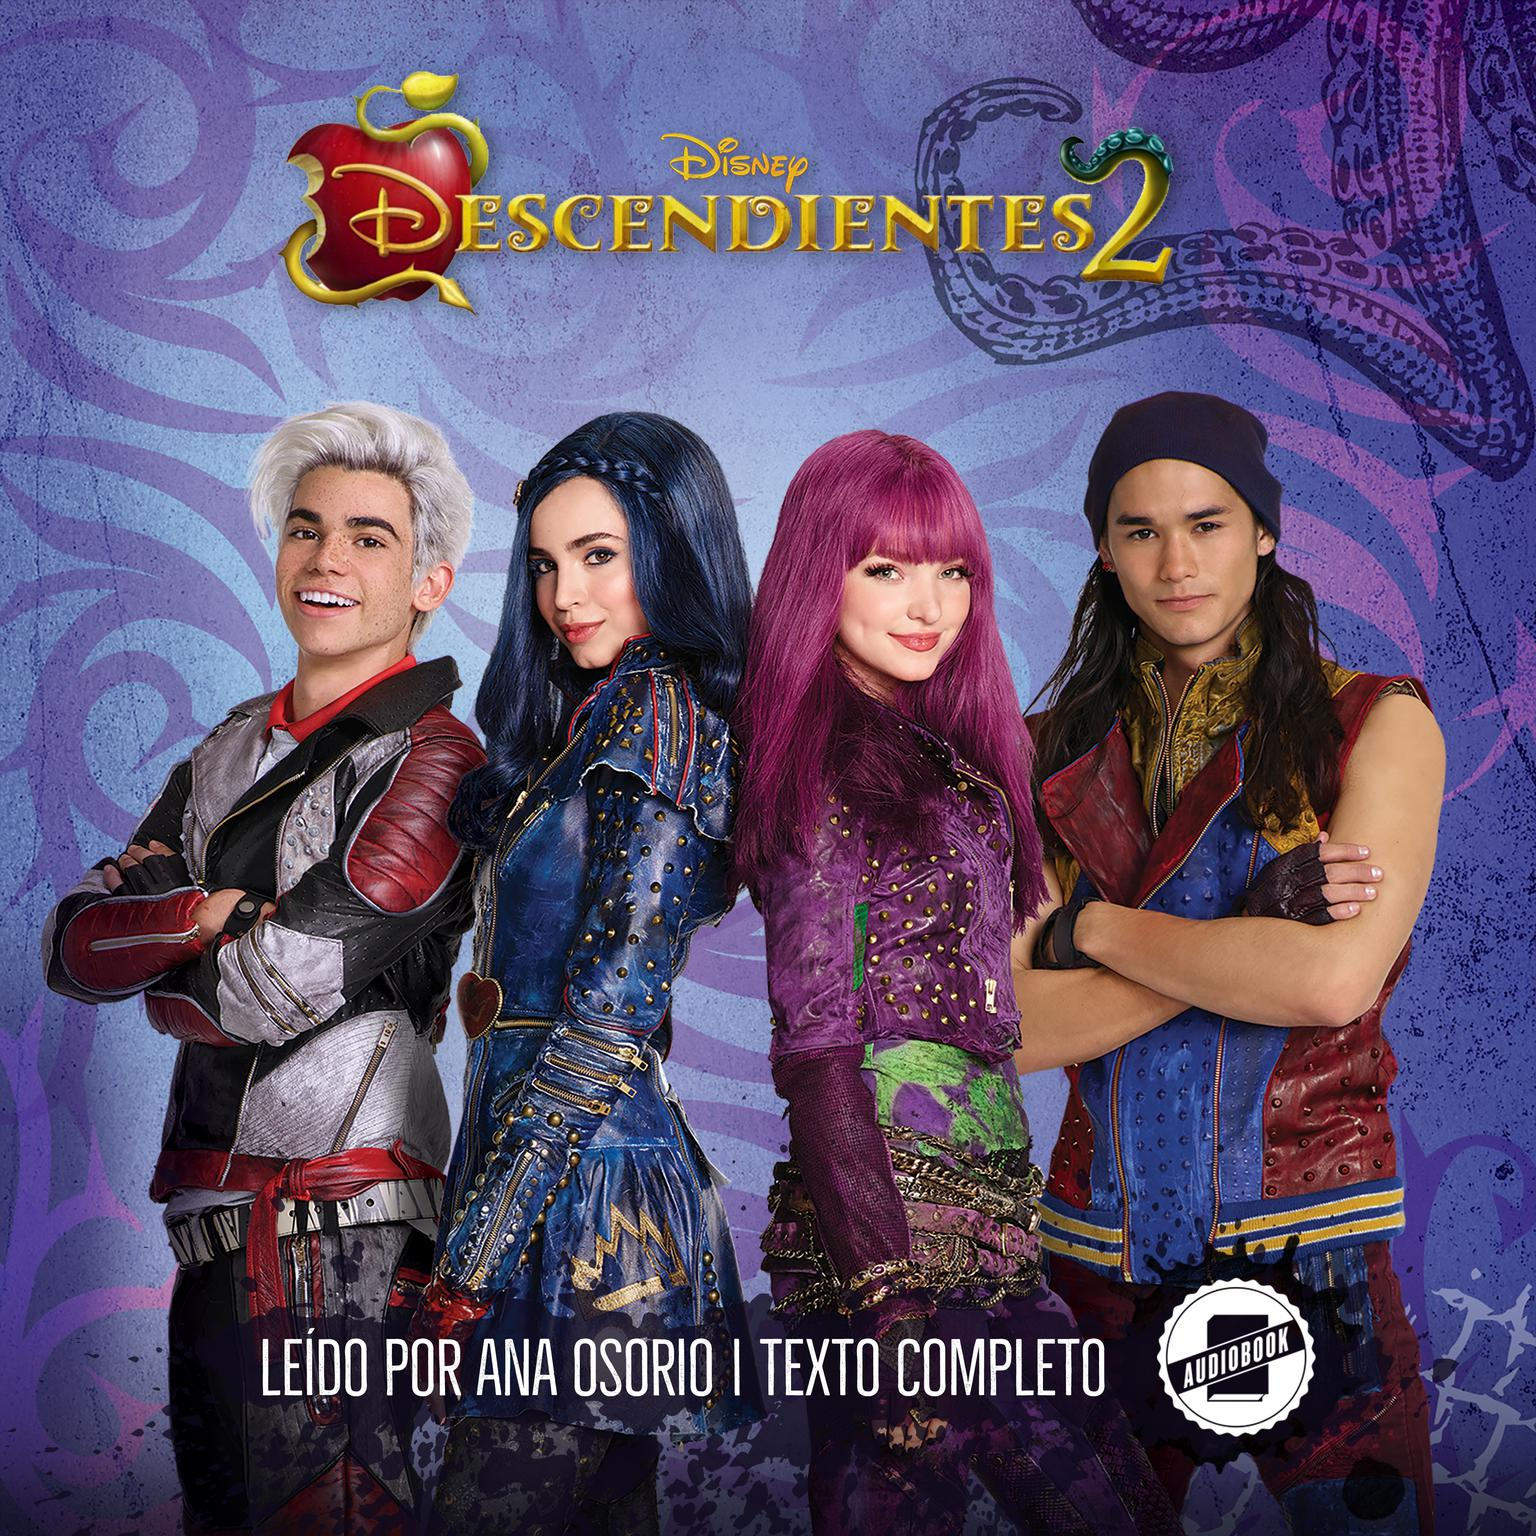 Descendants 2 (Spanish Edition): La Novela Audiobook, by Eric Geron